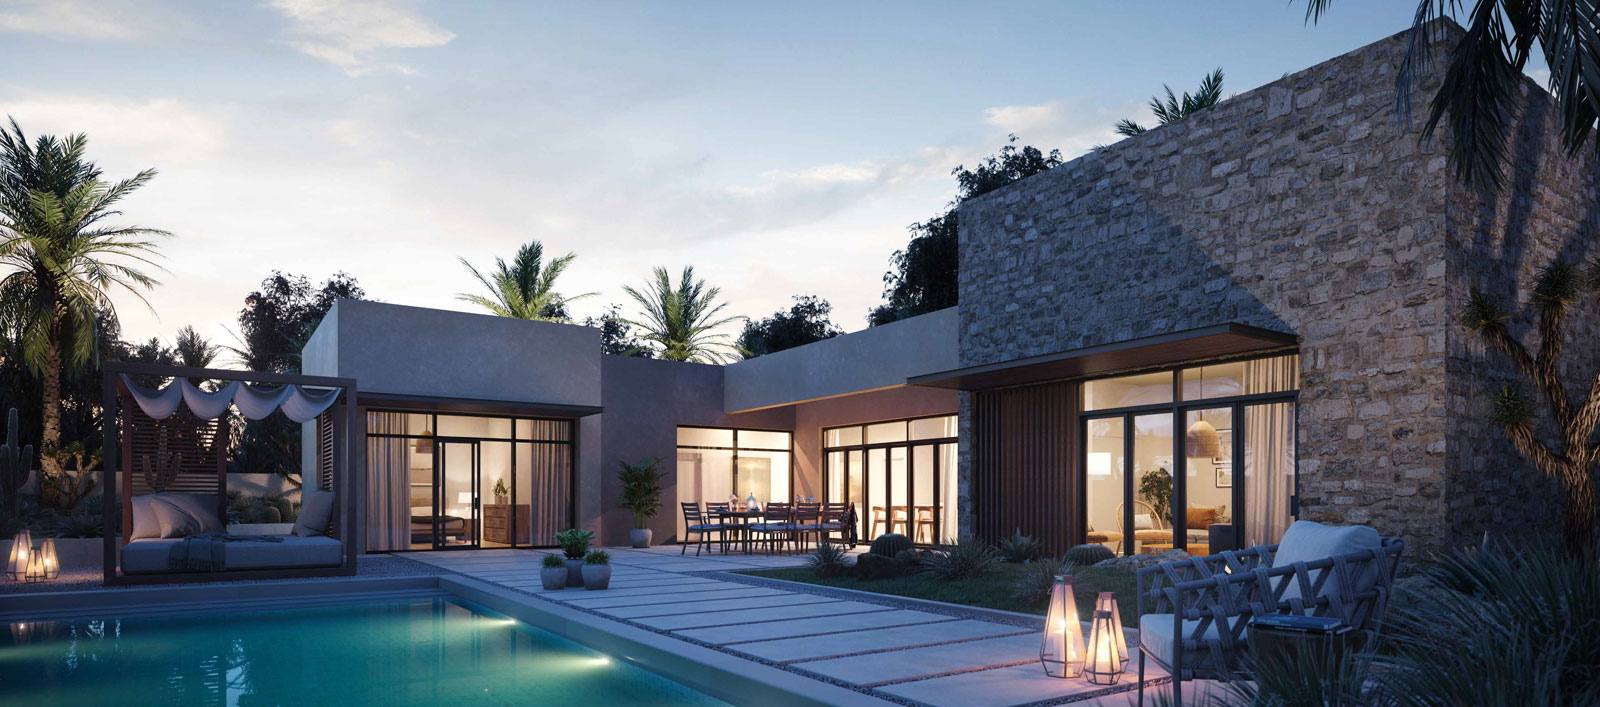 Budoor Villas Thumb Image